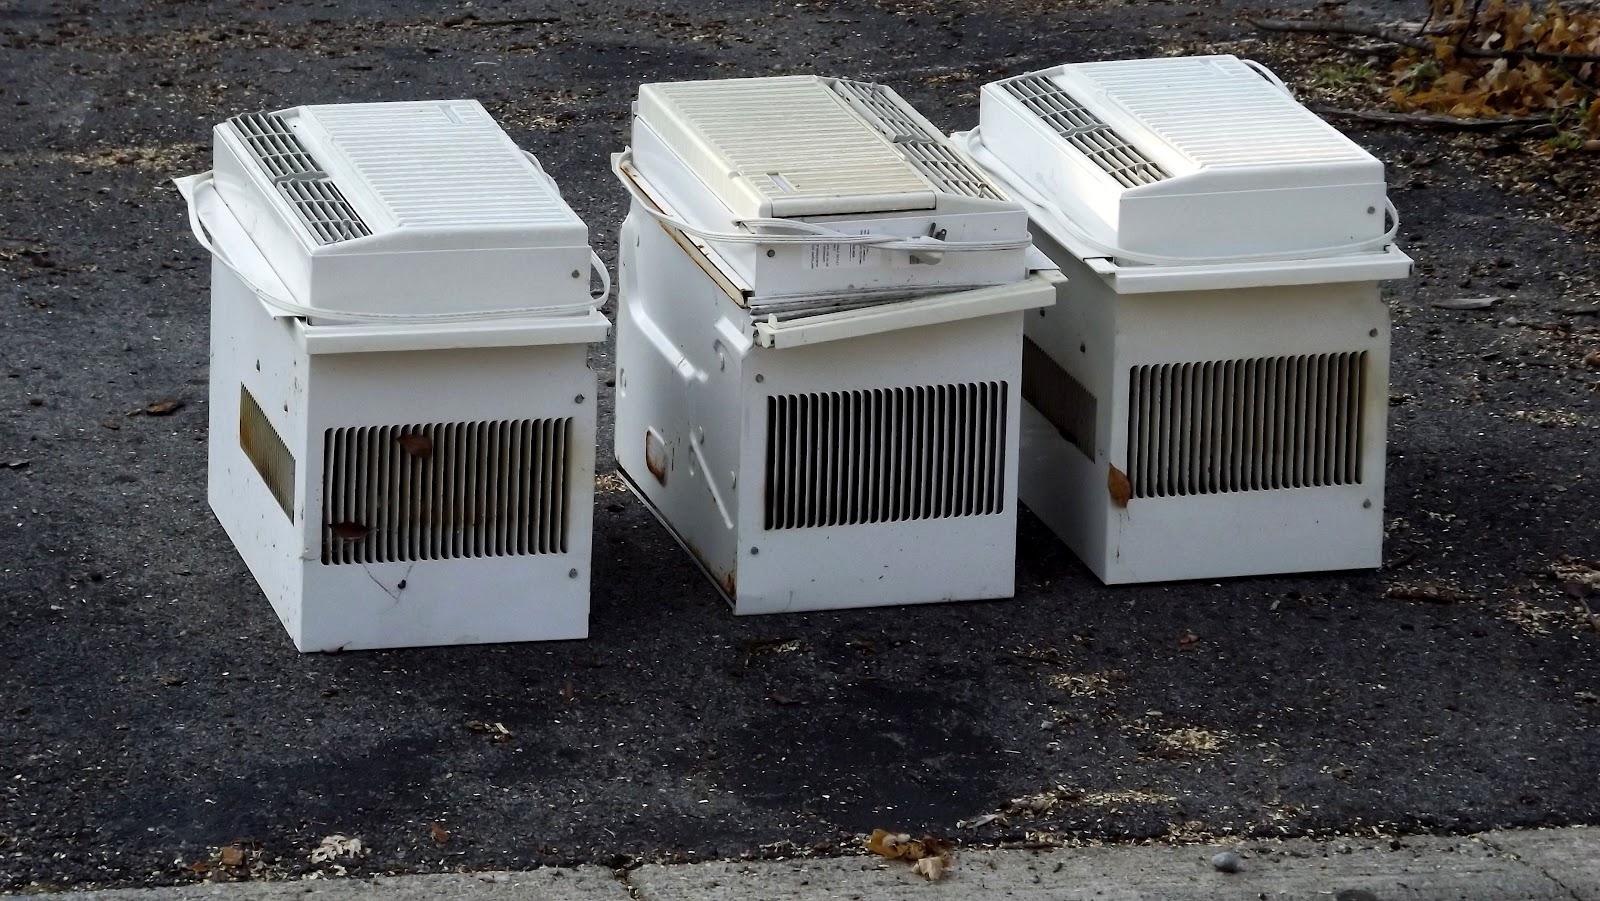 general appliance corporation transfer pricing problem Readbag users suggest that bsz263432882inhpdf is worth reading transfer pricing problems 248 case 6-2: general appliance corporation 256 case 6-4.